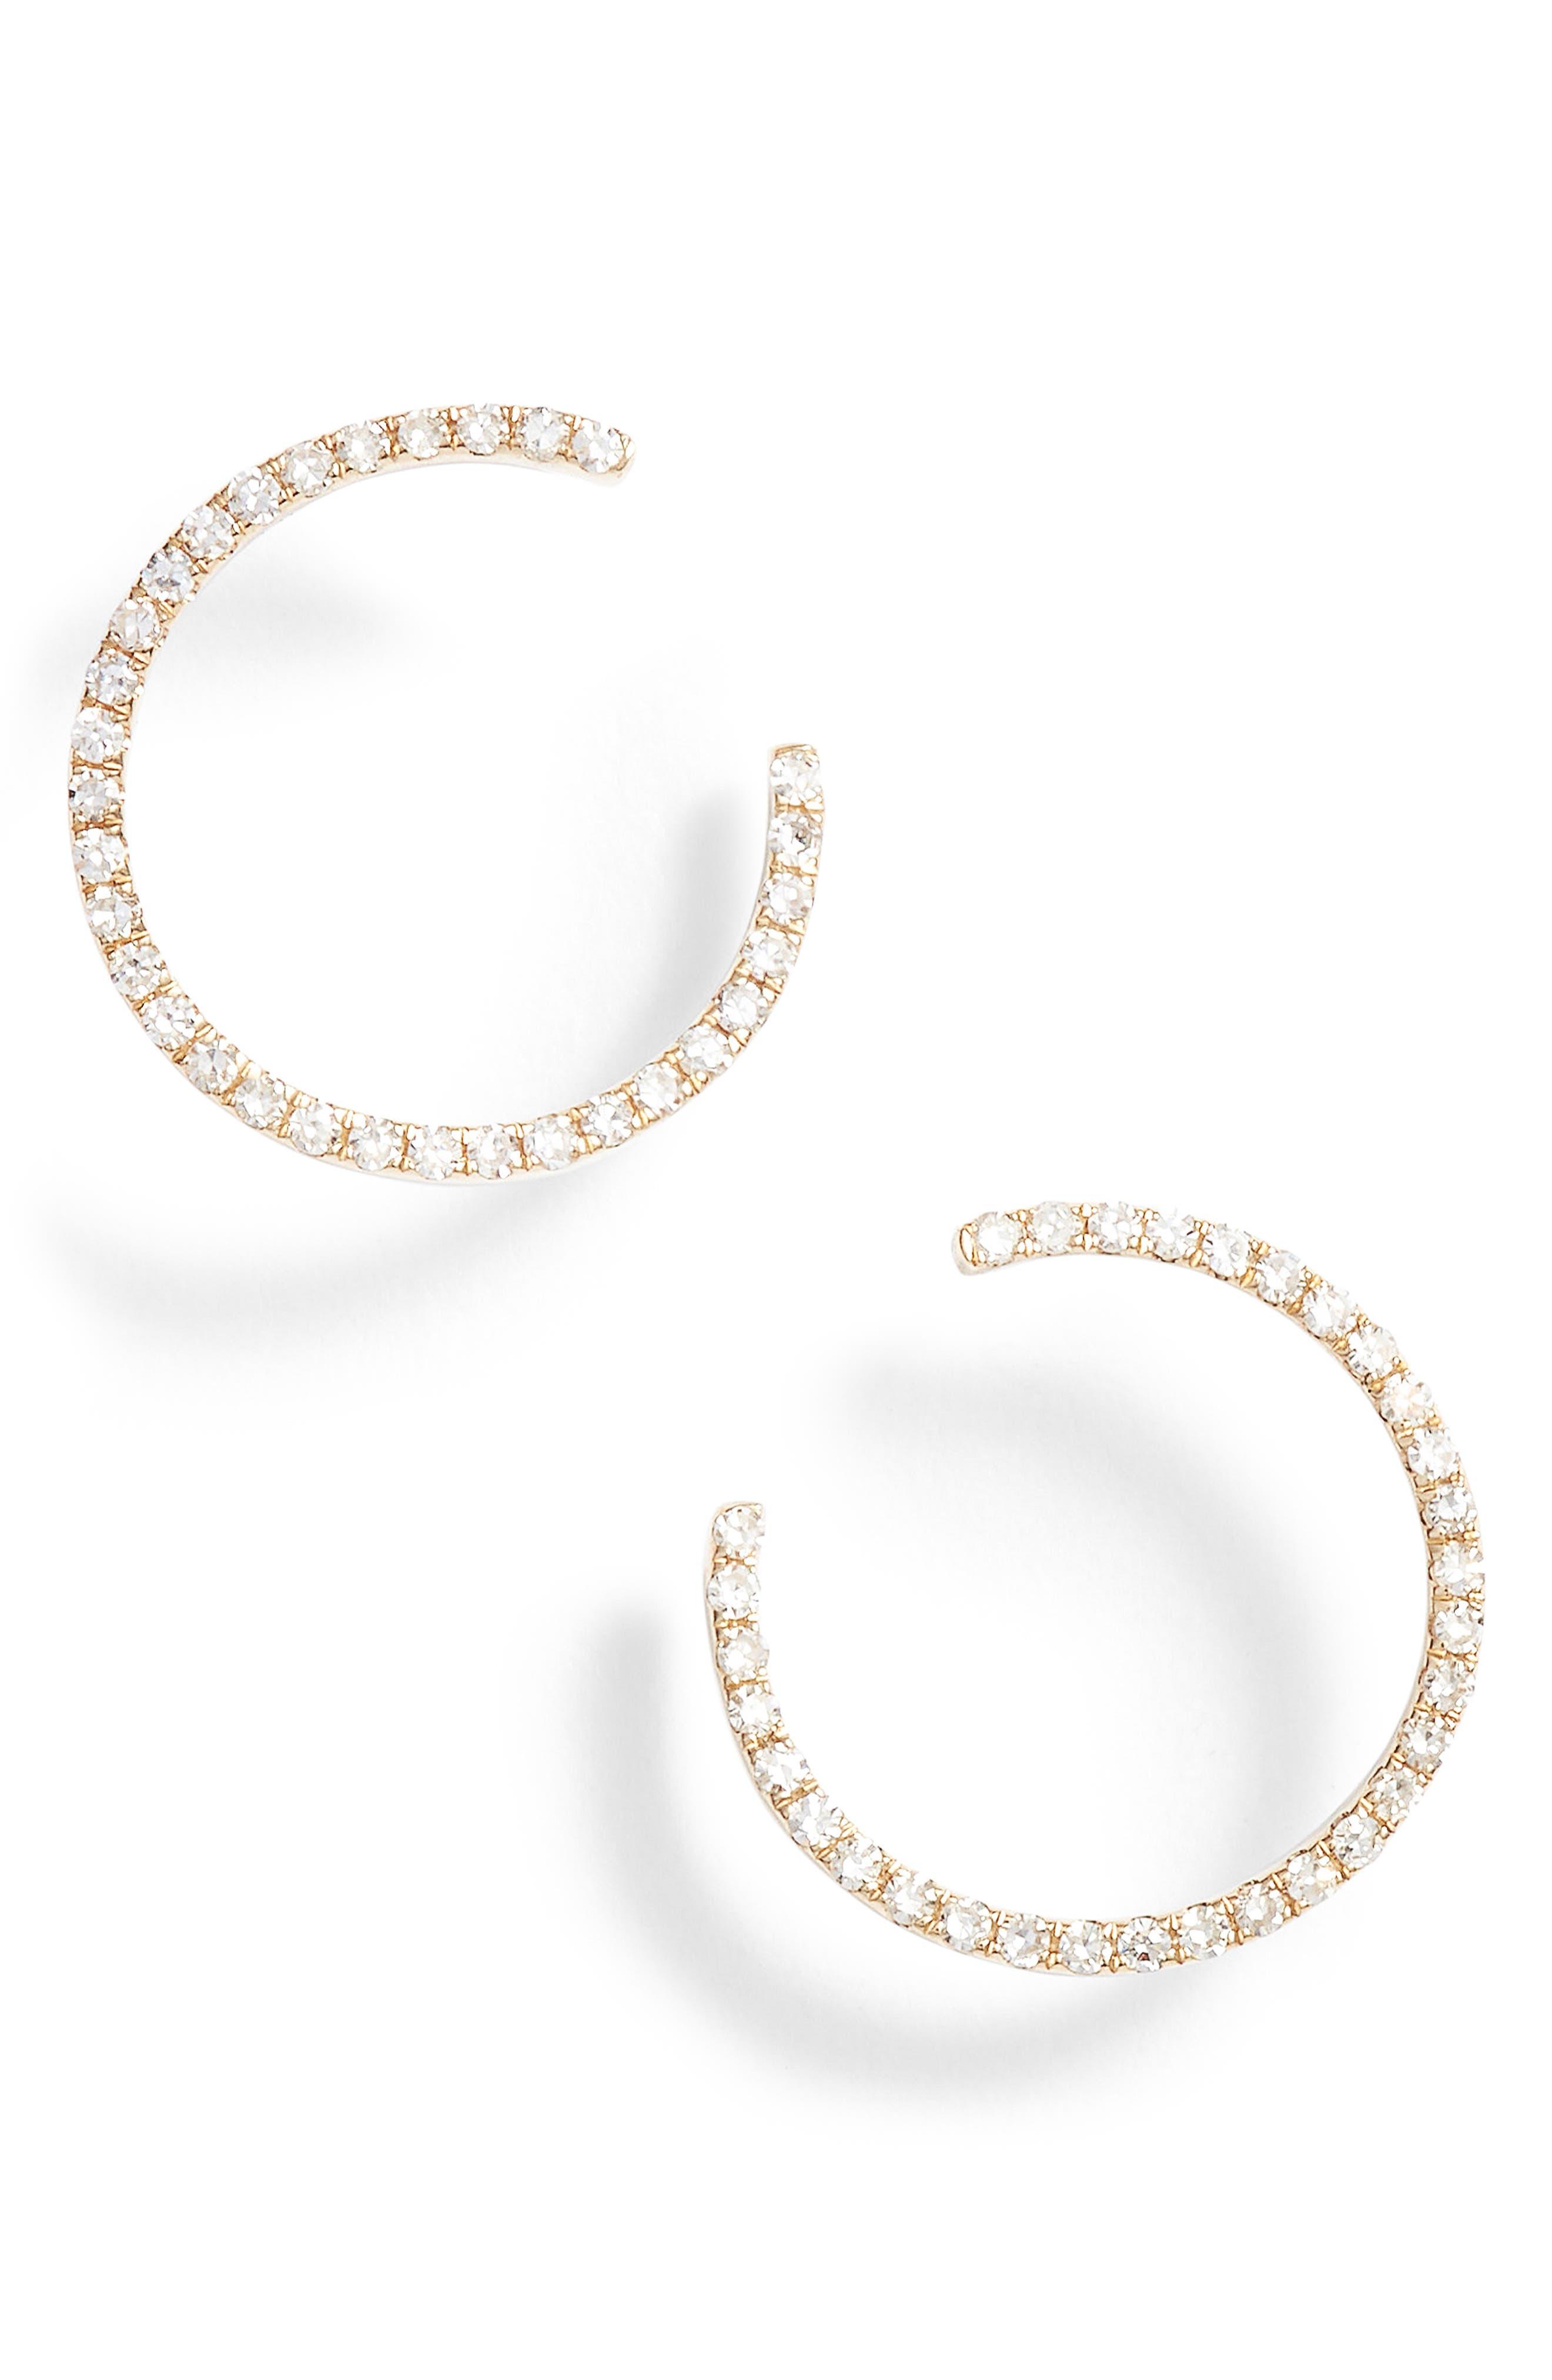 Diamond Illusion Hoop Earrings,                             Main thumbnail 1, color,                             710